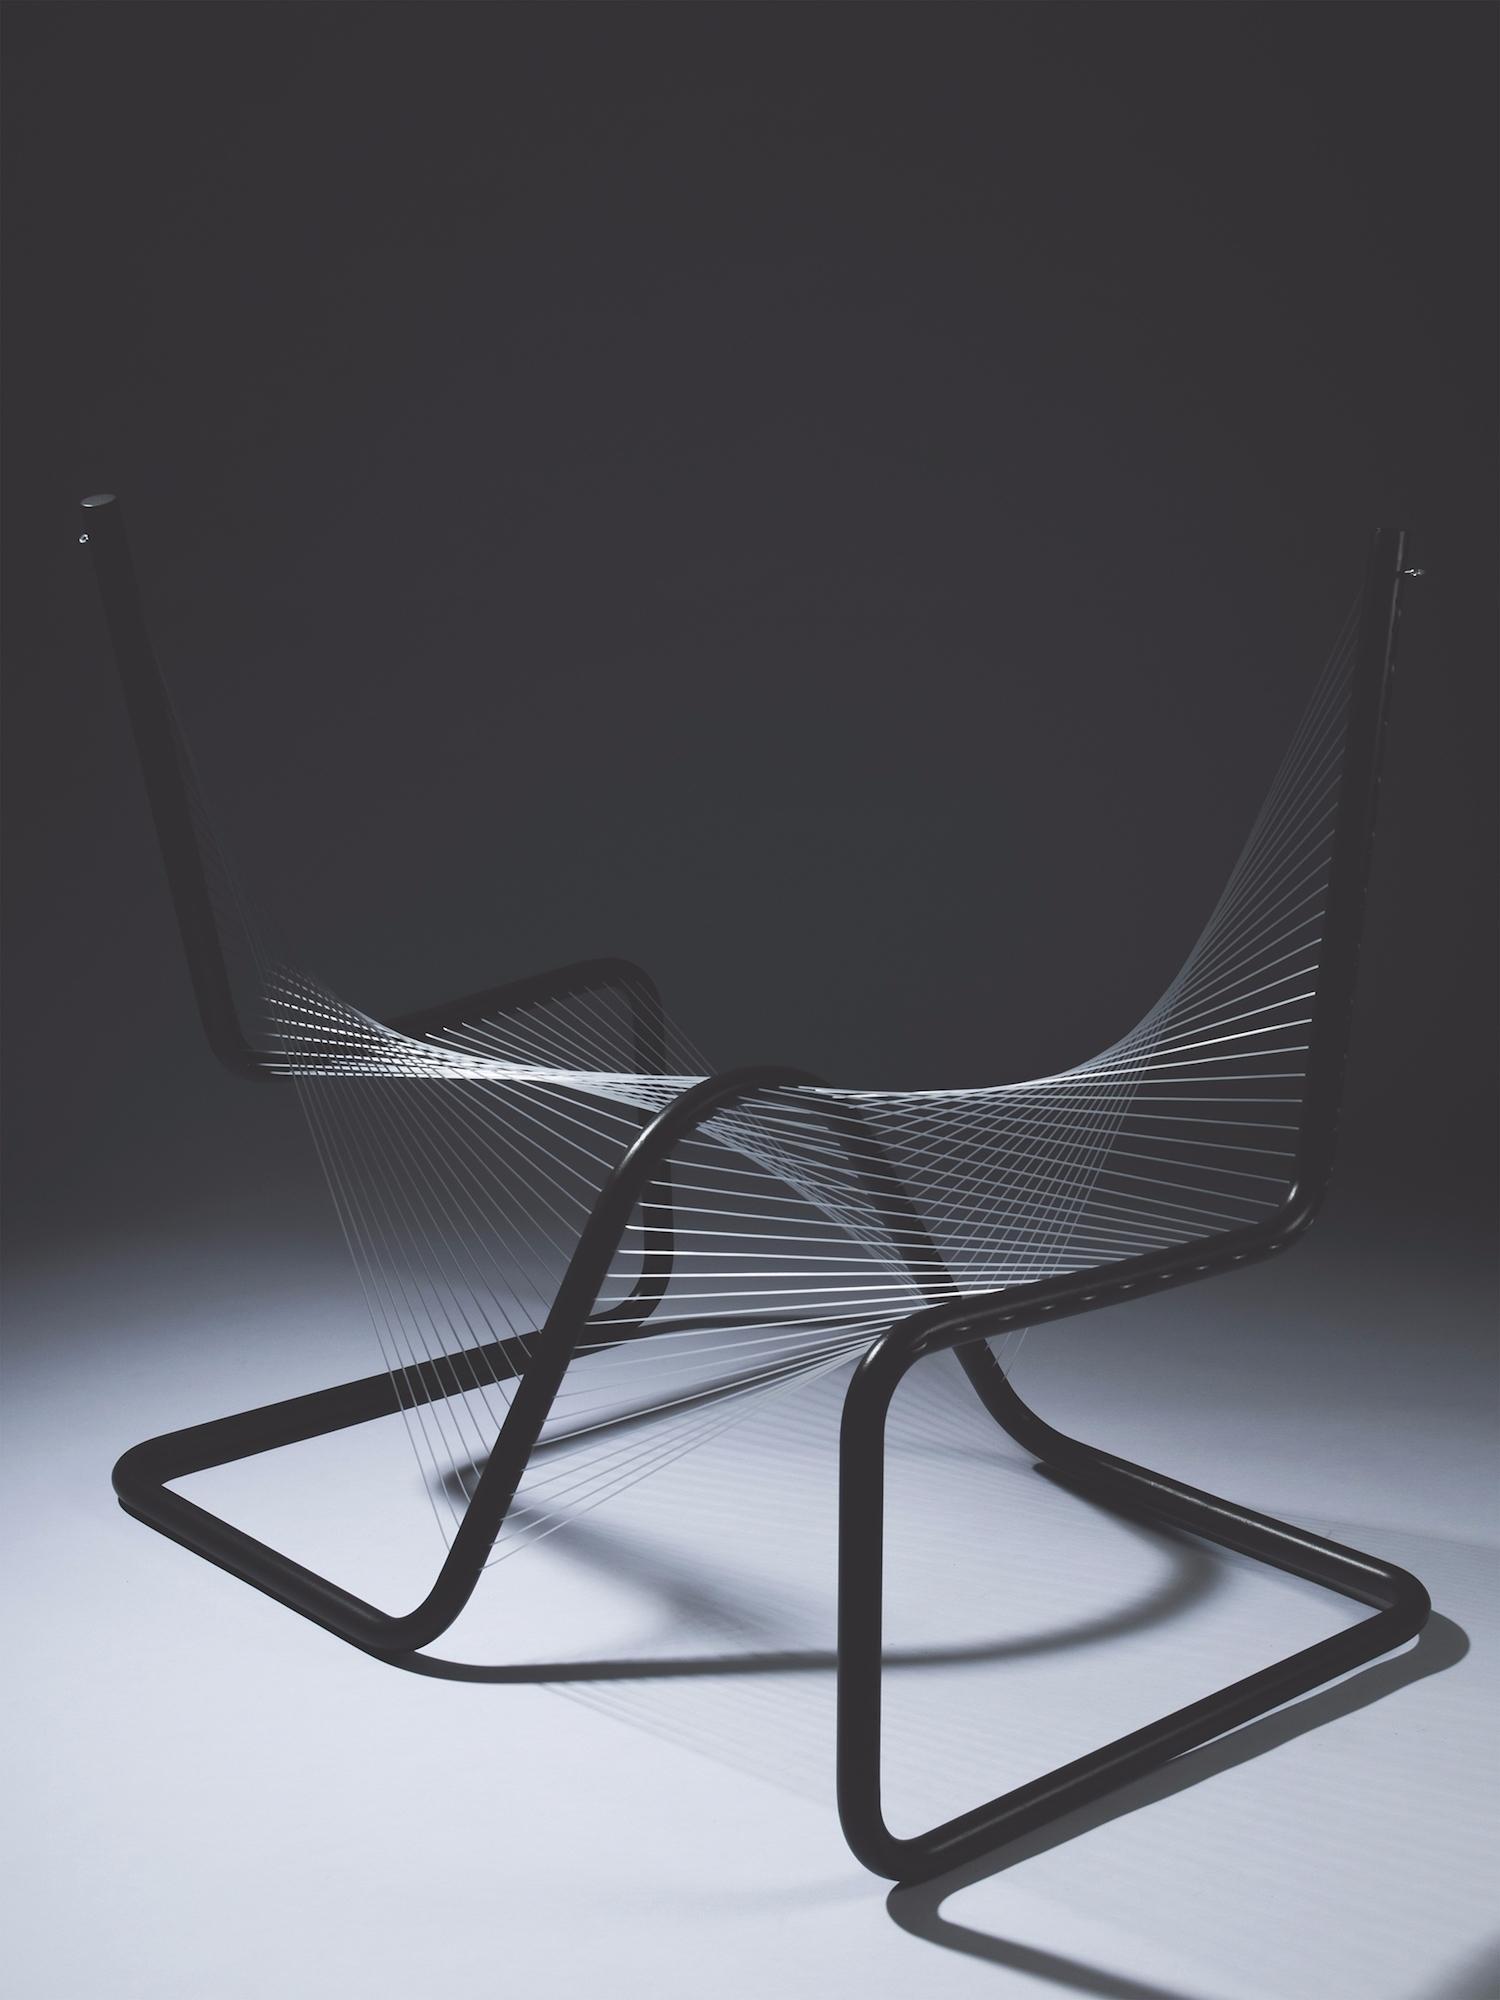 'Saitens' Chair Clara Schweers  - thetreemag | ello